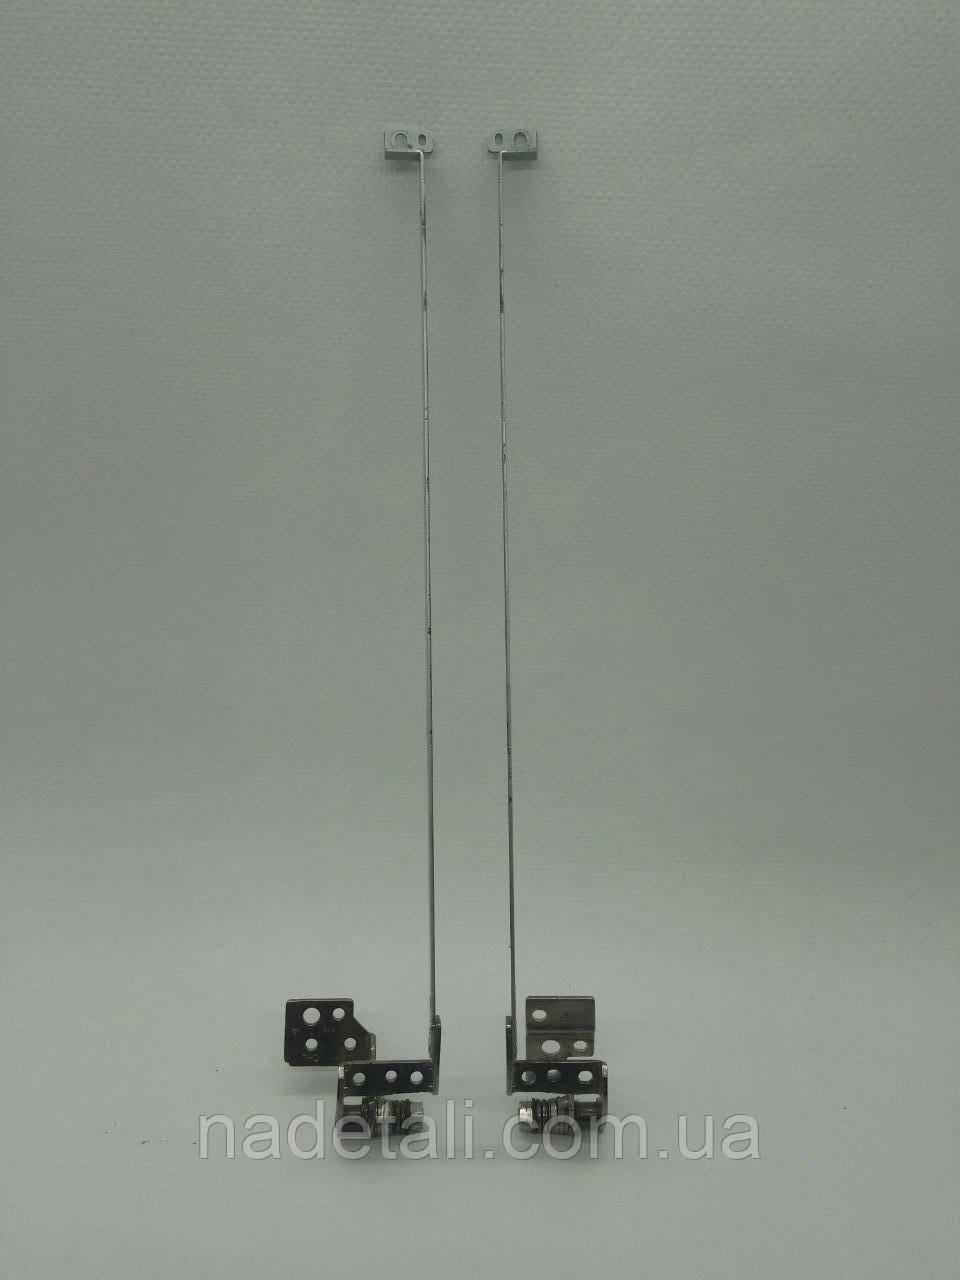 Петли eMachines E442 AM0C9000300 AM0C9000400